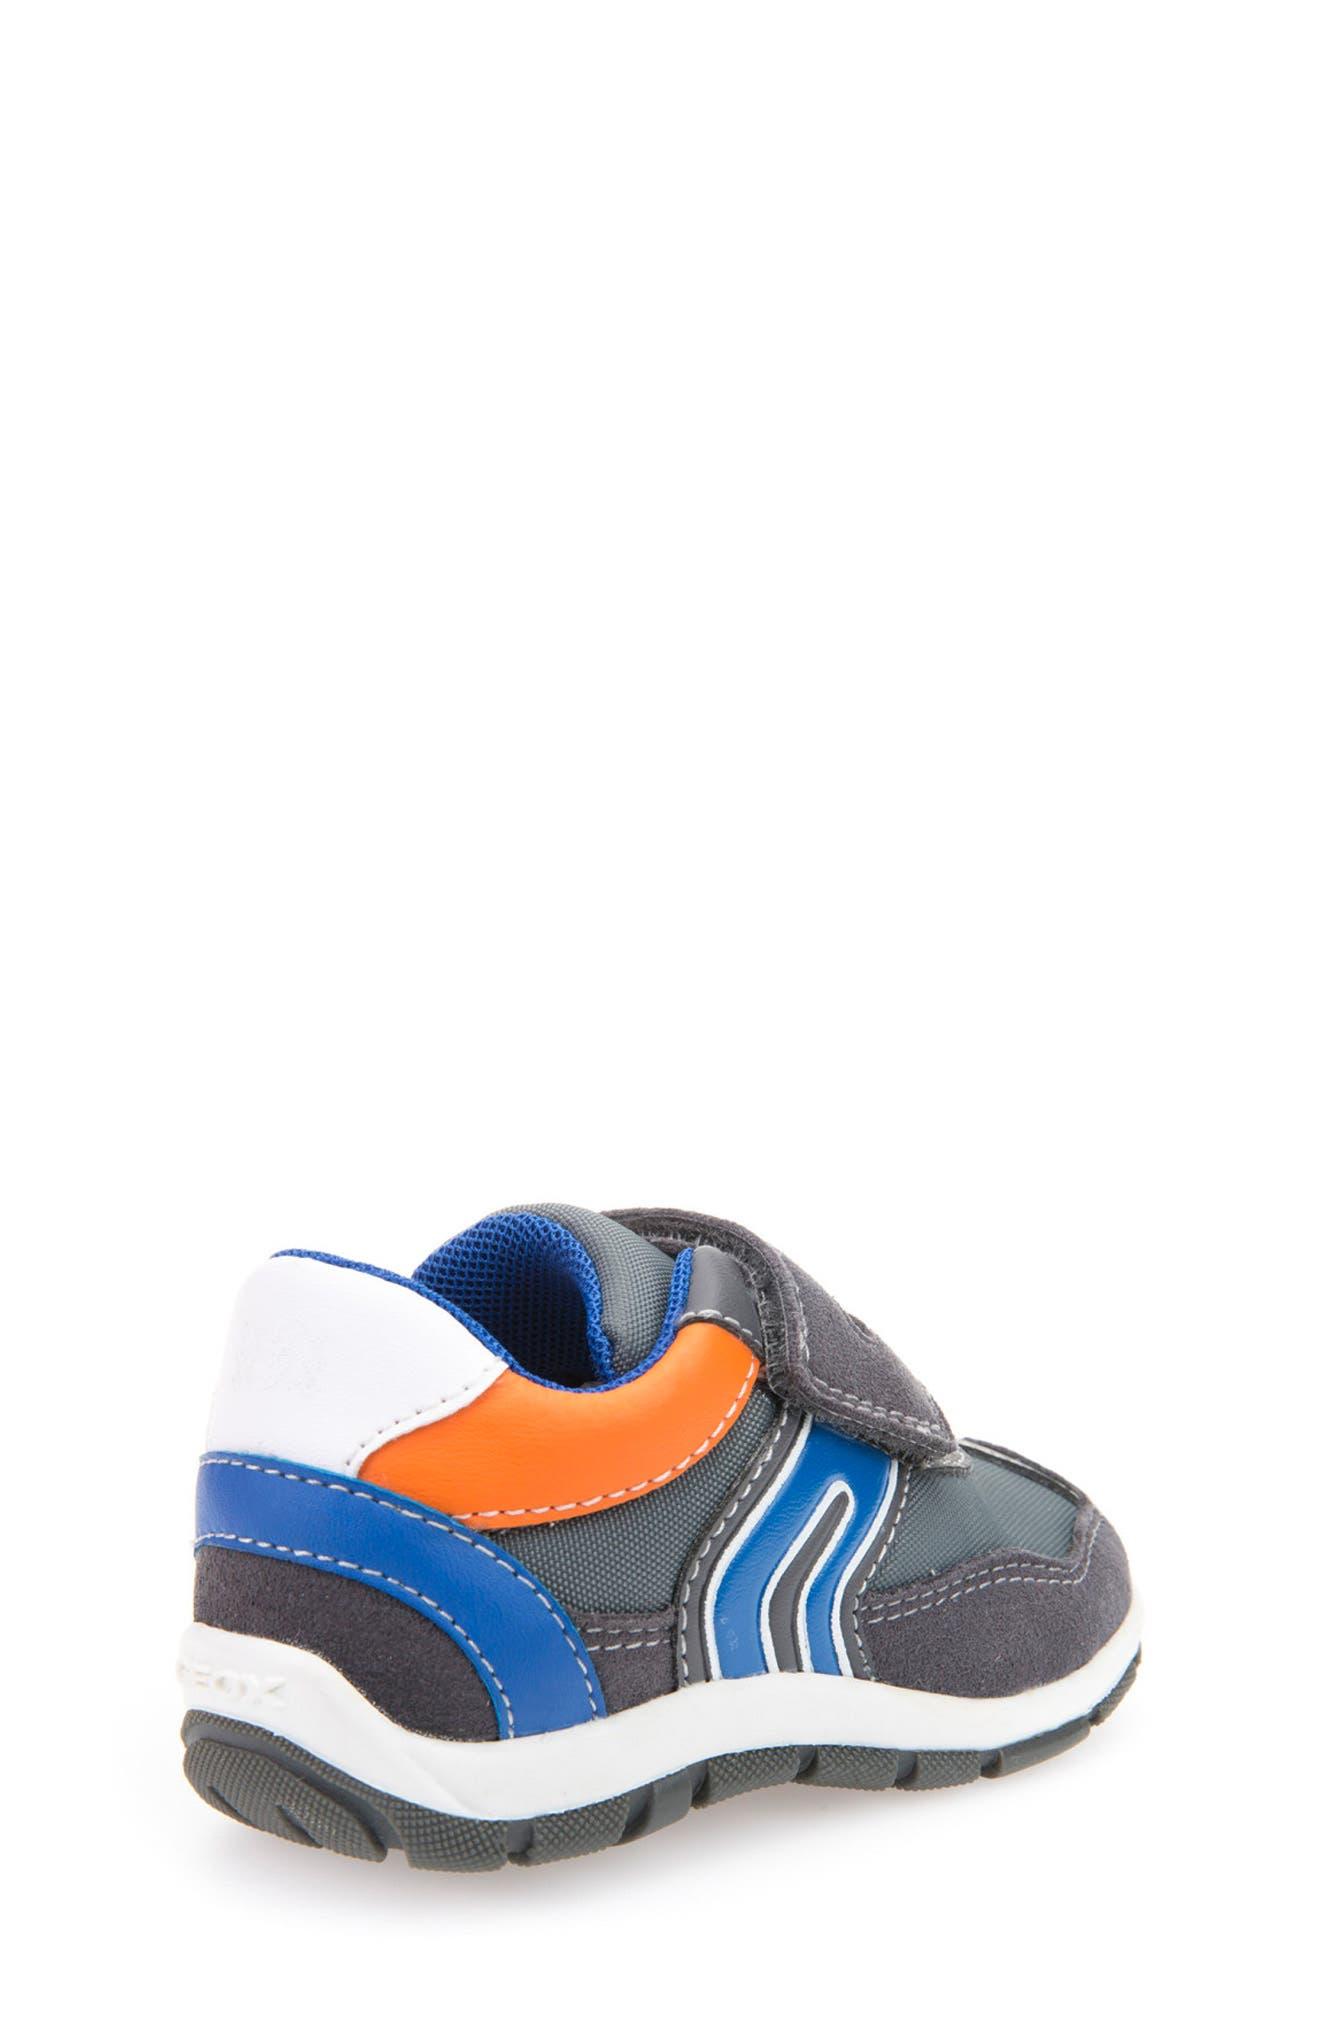 Shaax Sneaker,                             Alternate thumbnail 7, color,                             073